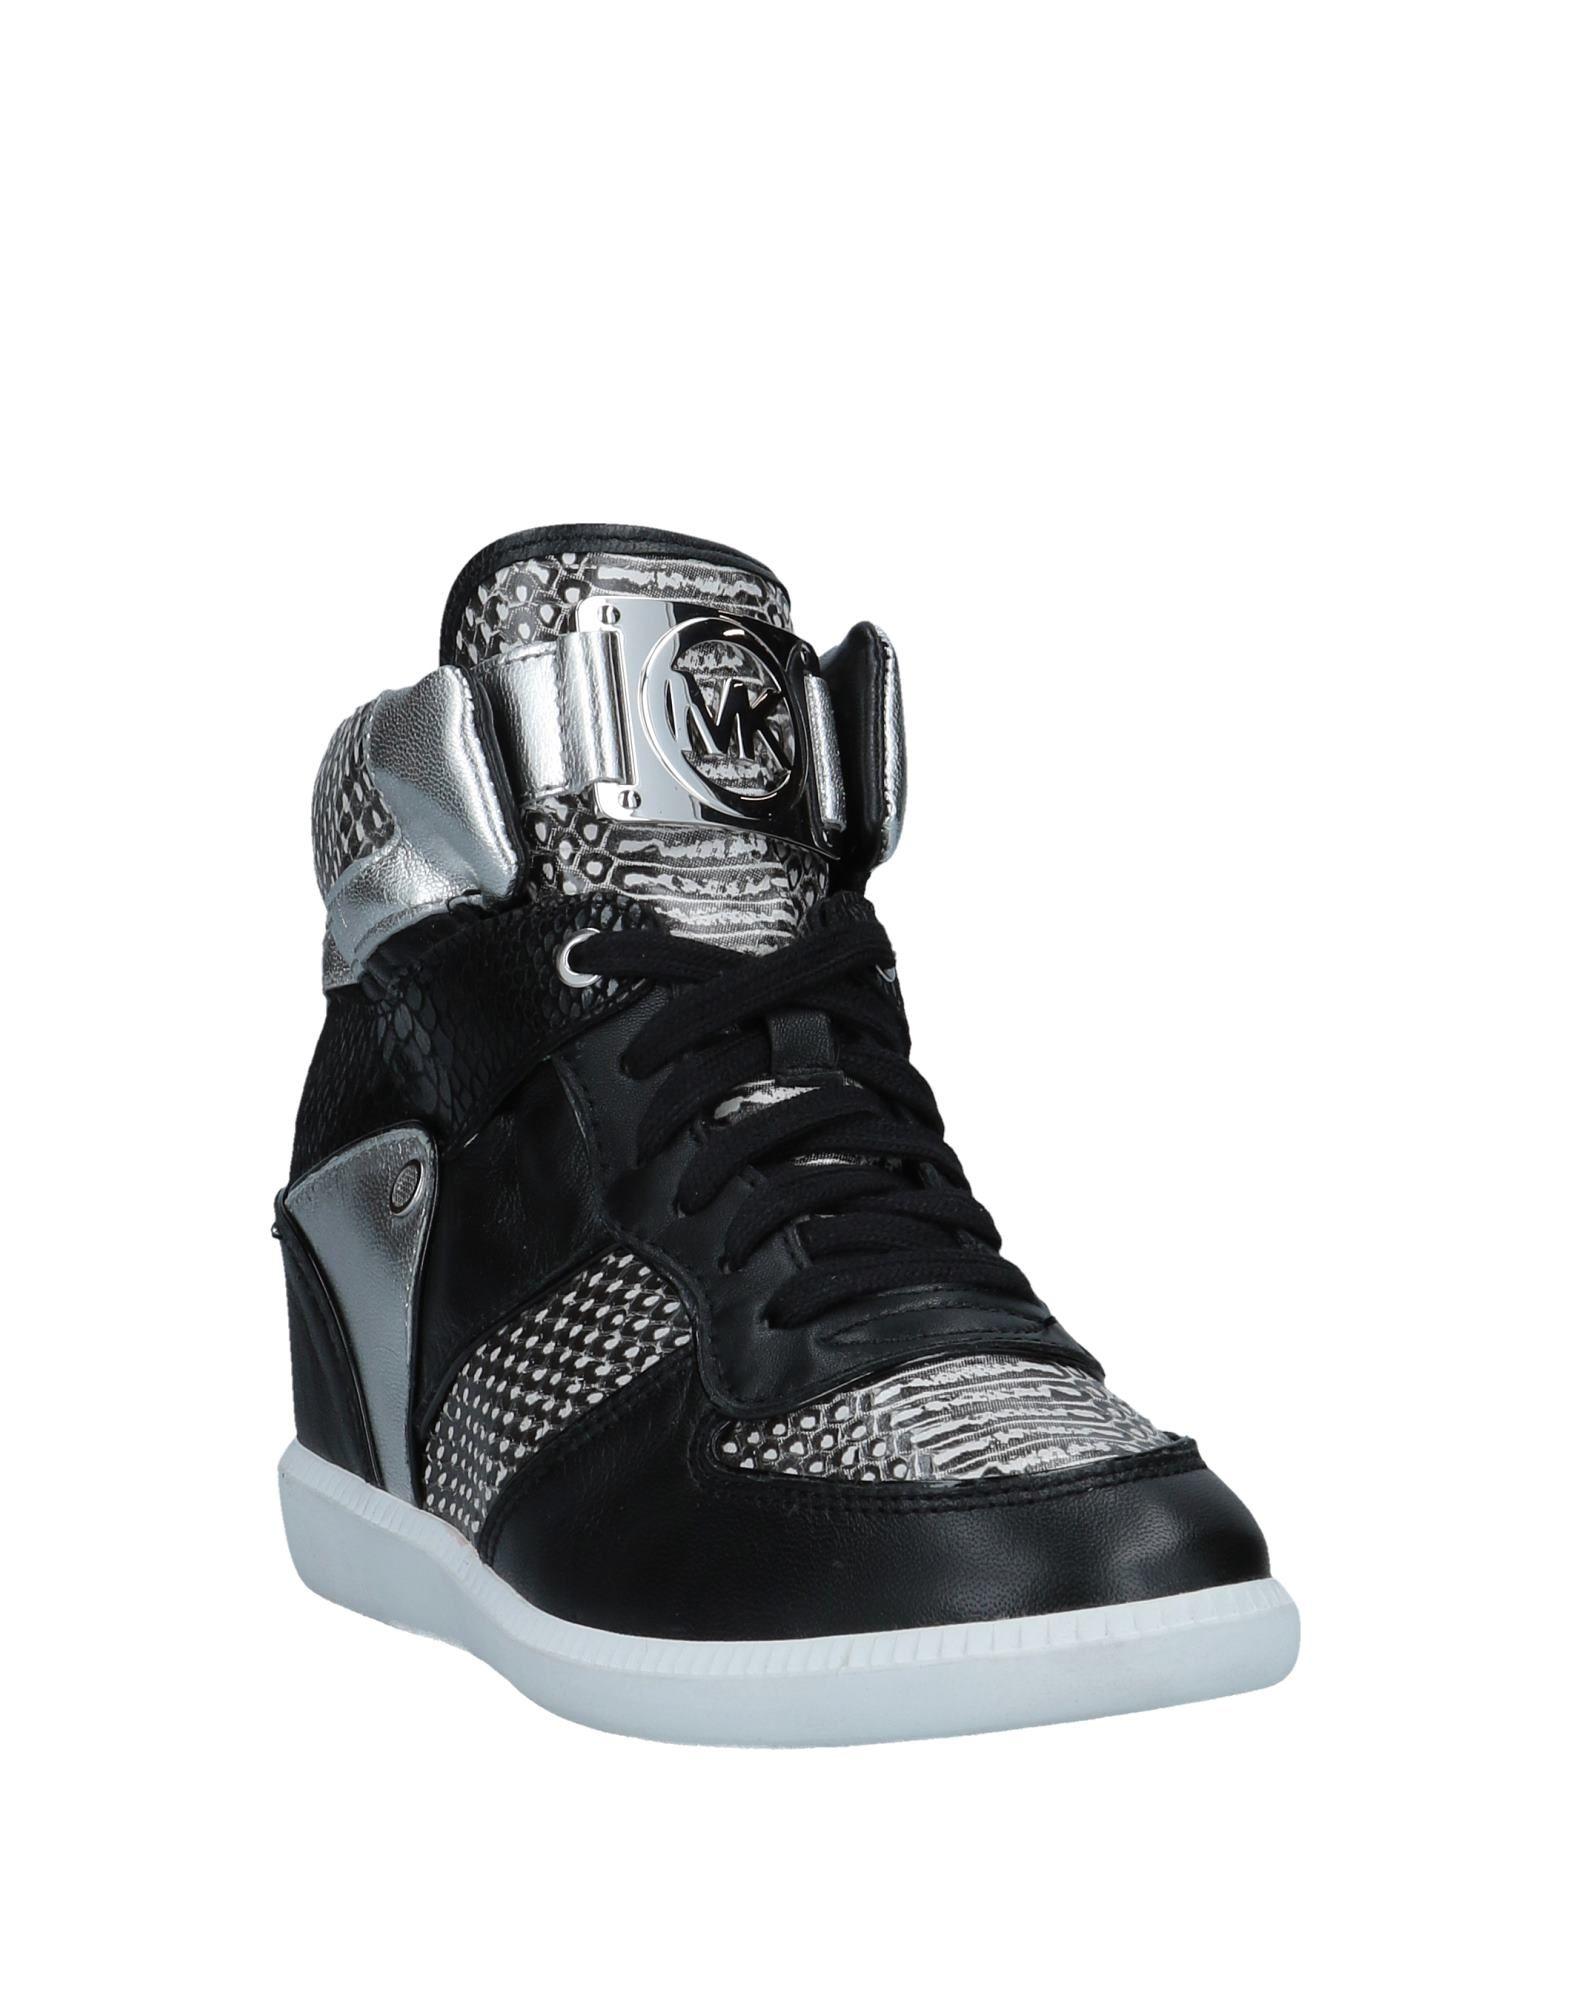 ba30a53678 MICHAEL MICHAEL KORS ΠΑΠΟΥΤΣΙΑ Χαμηλά sneakers